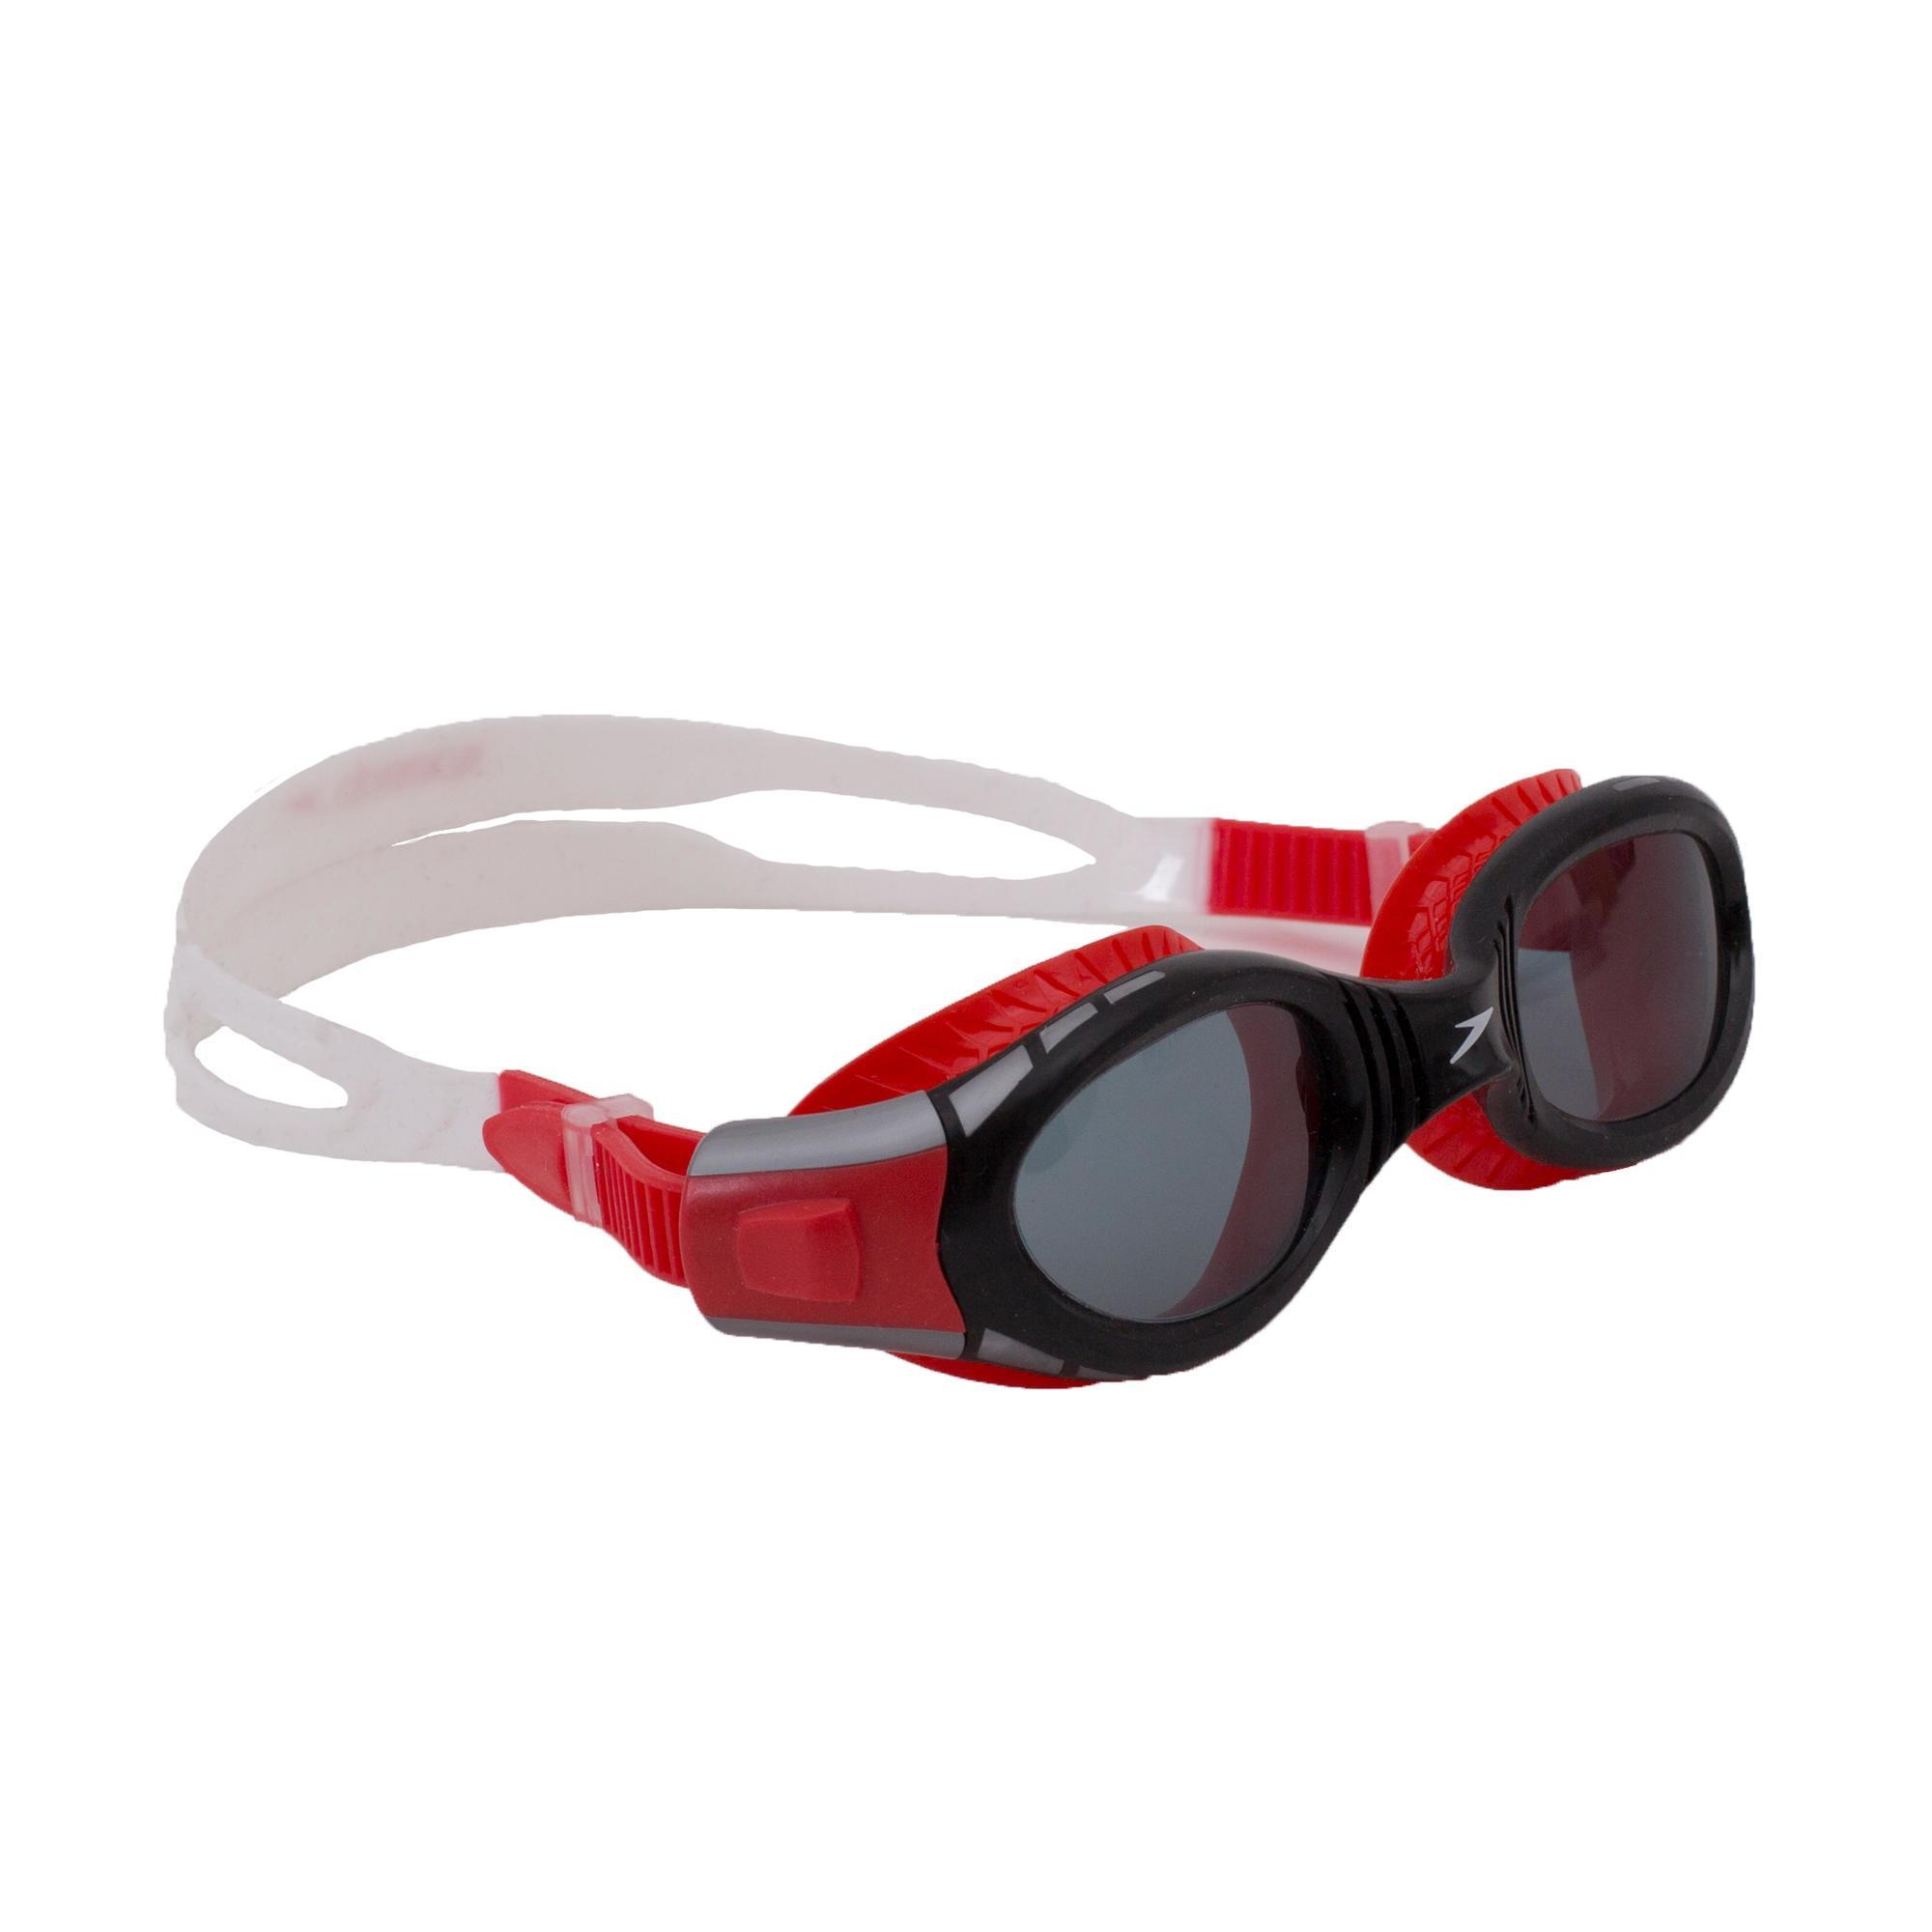 Speedo Zwembril Futura Biofuse S helder rood